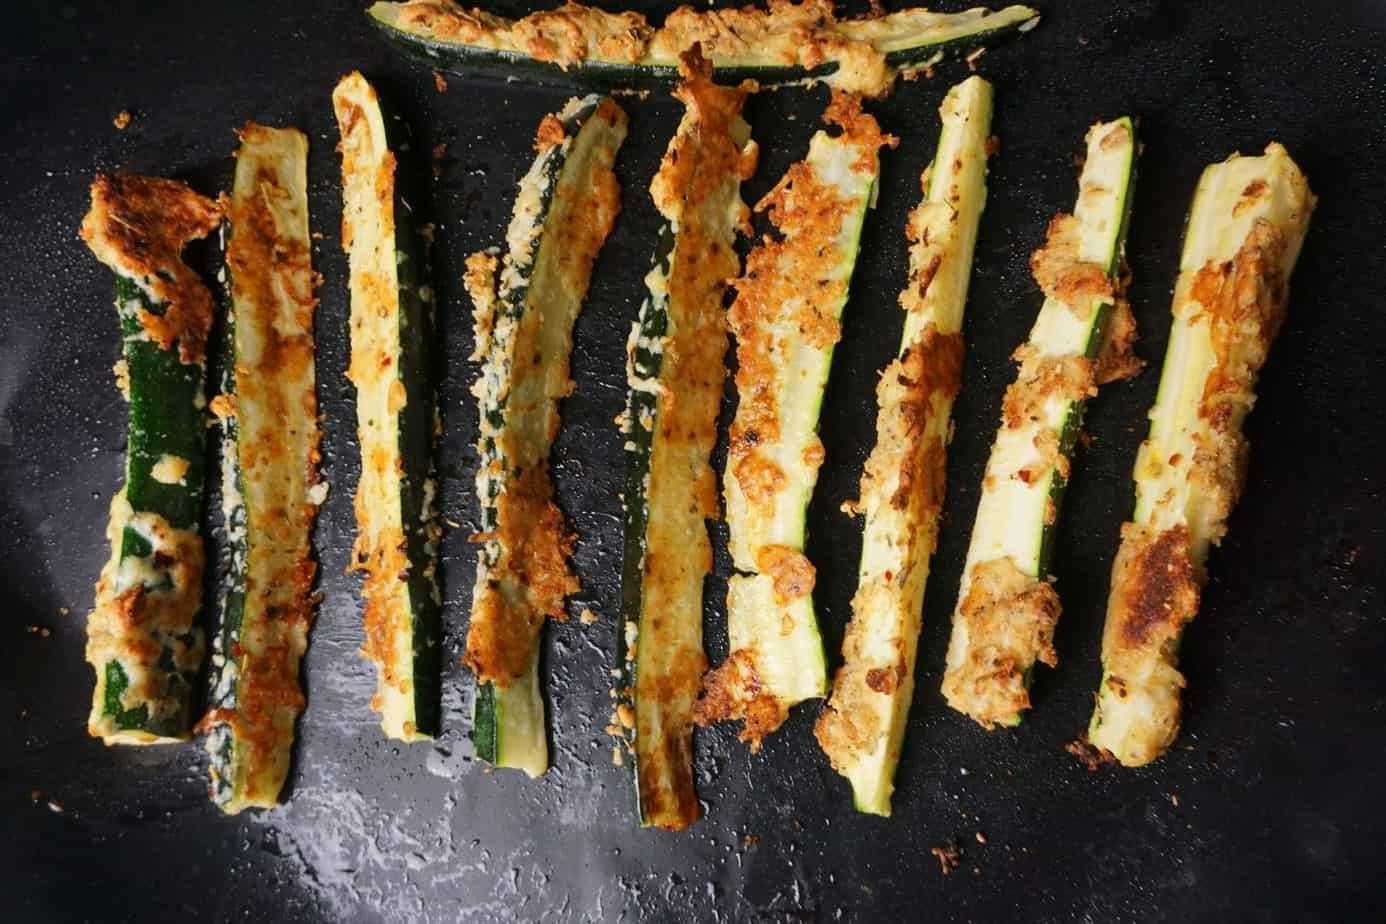 crisp zucchini fries on a baking sheet